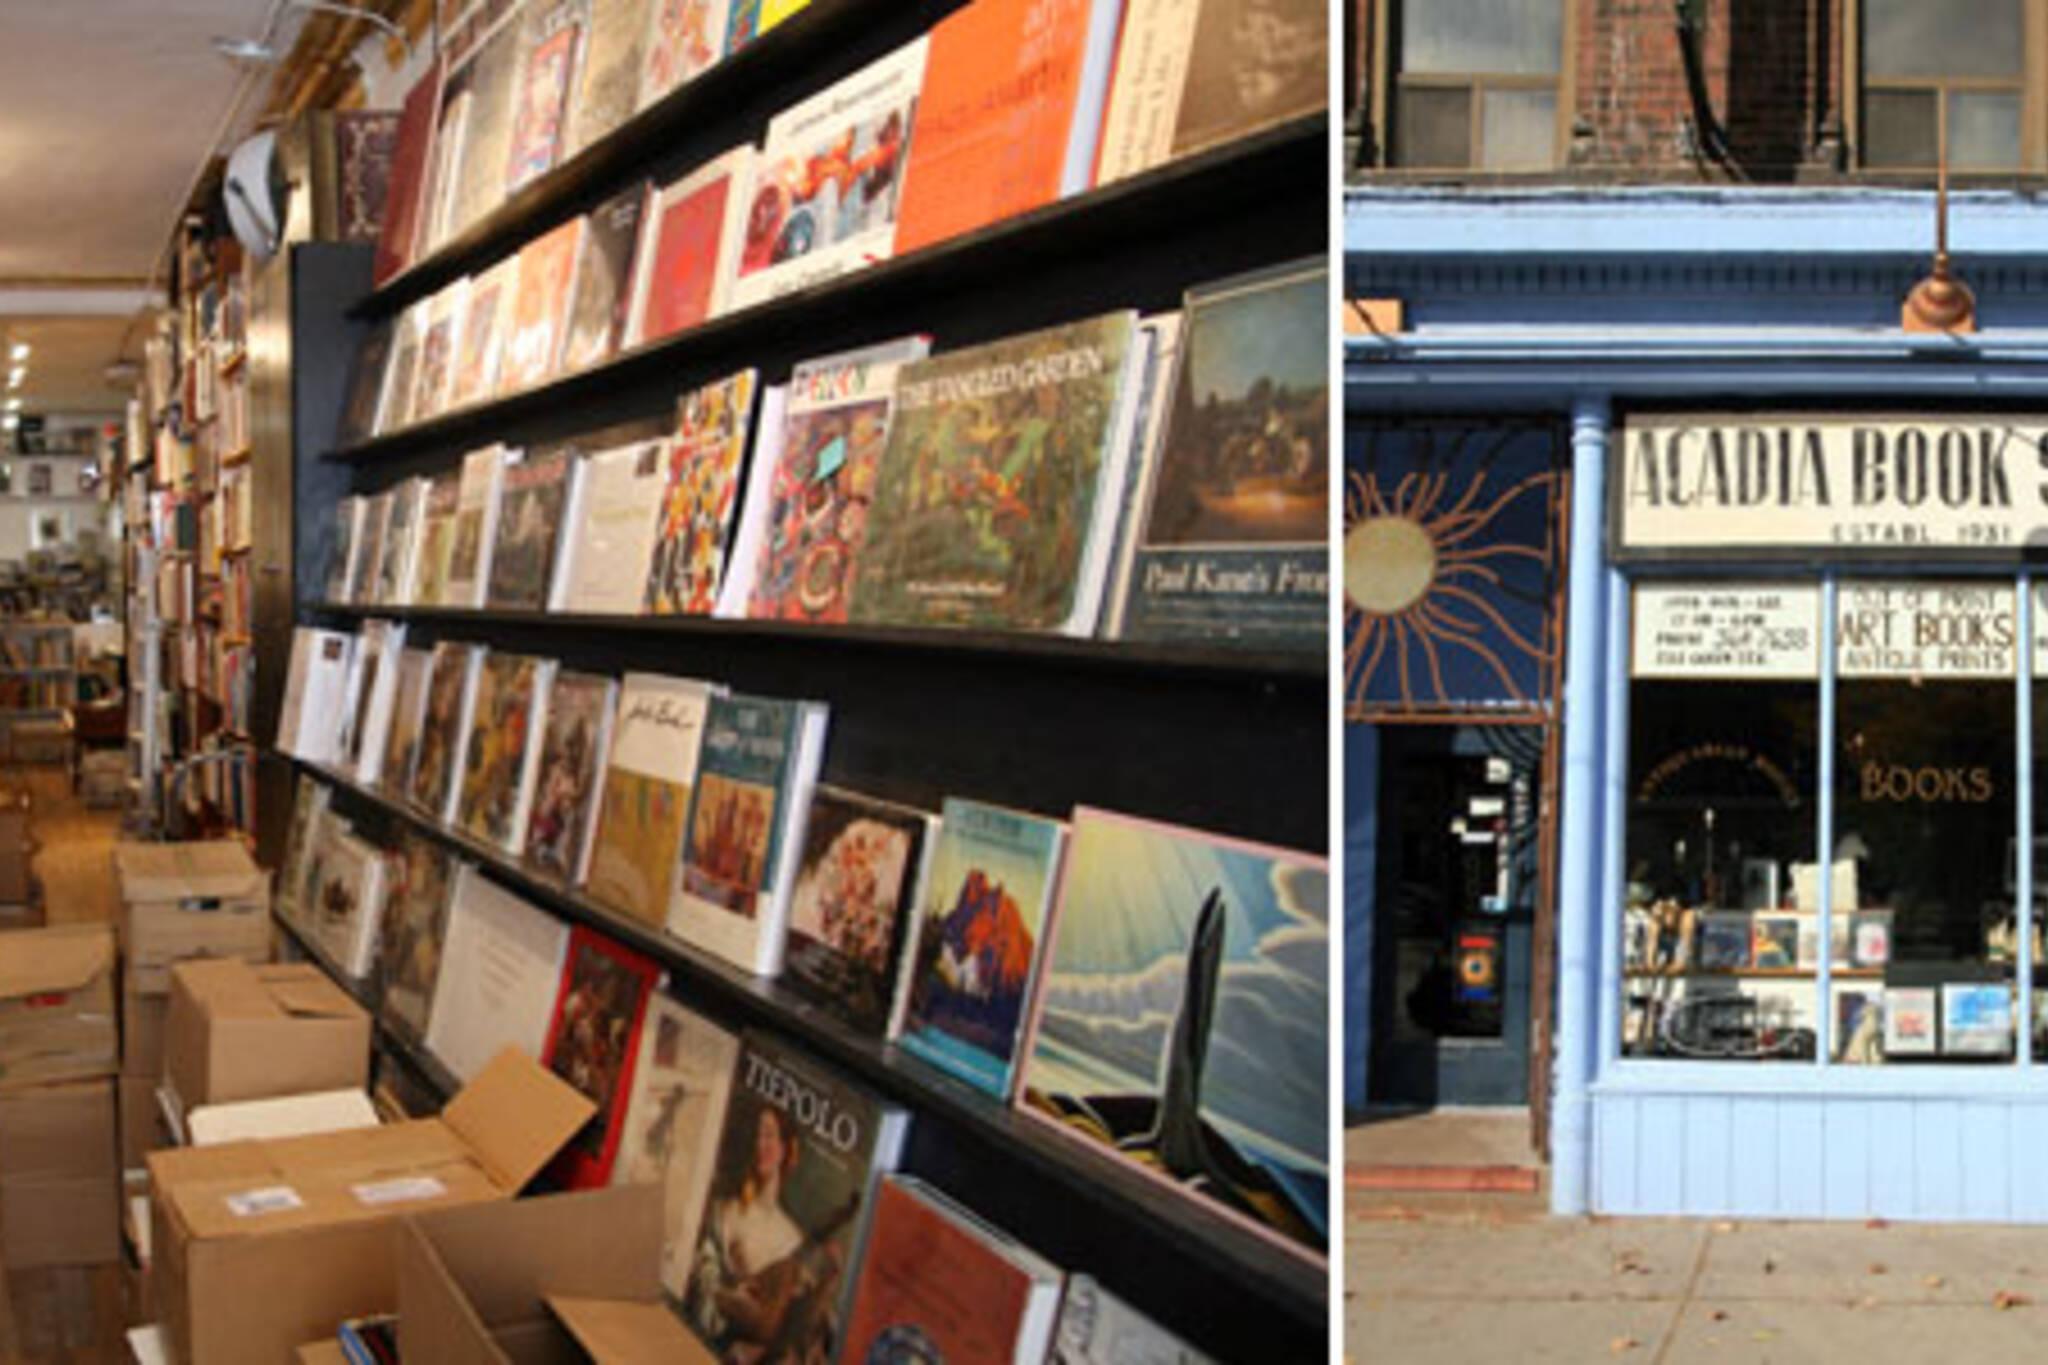 Toronto's oldest bookstore